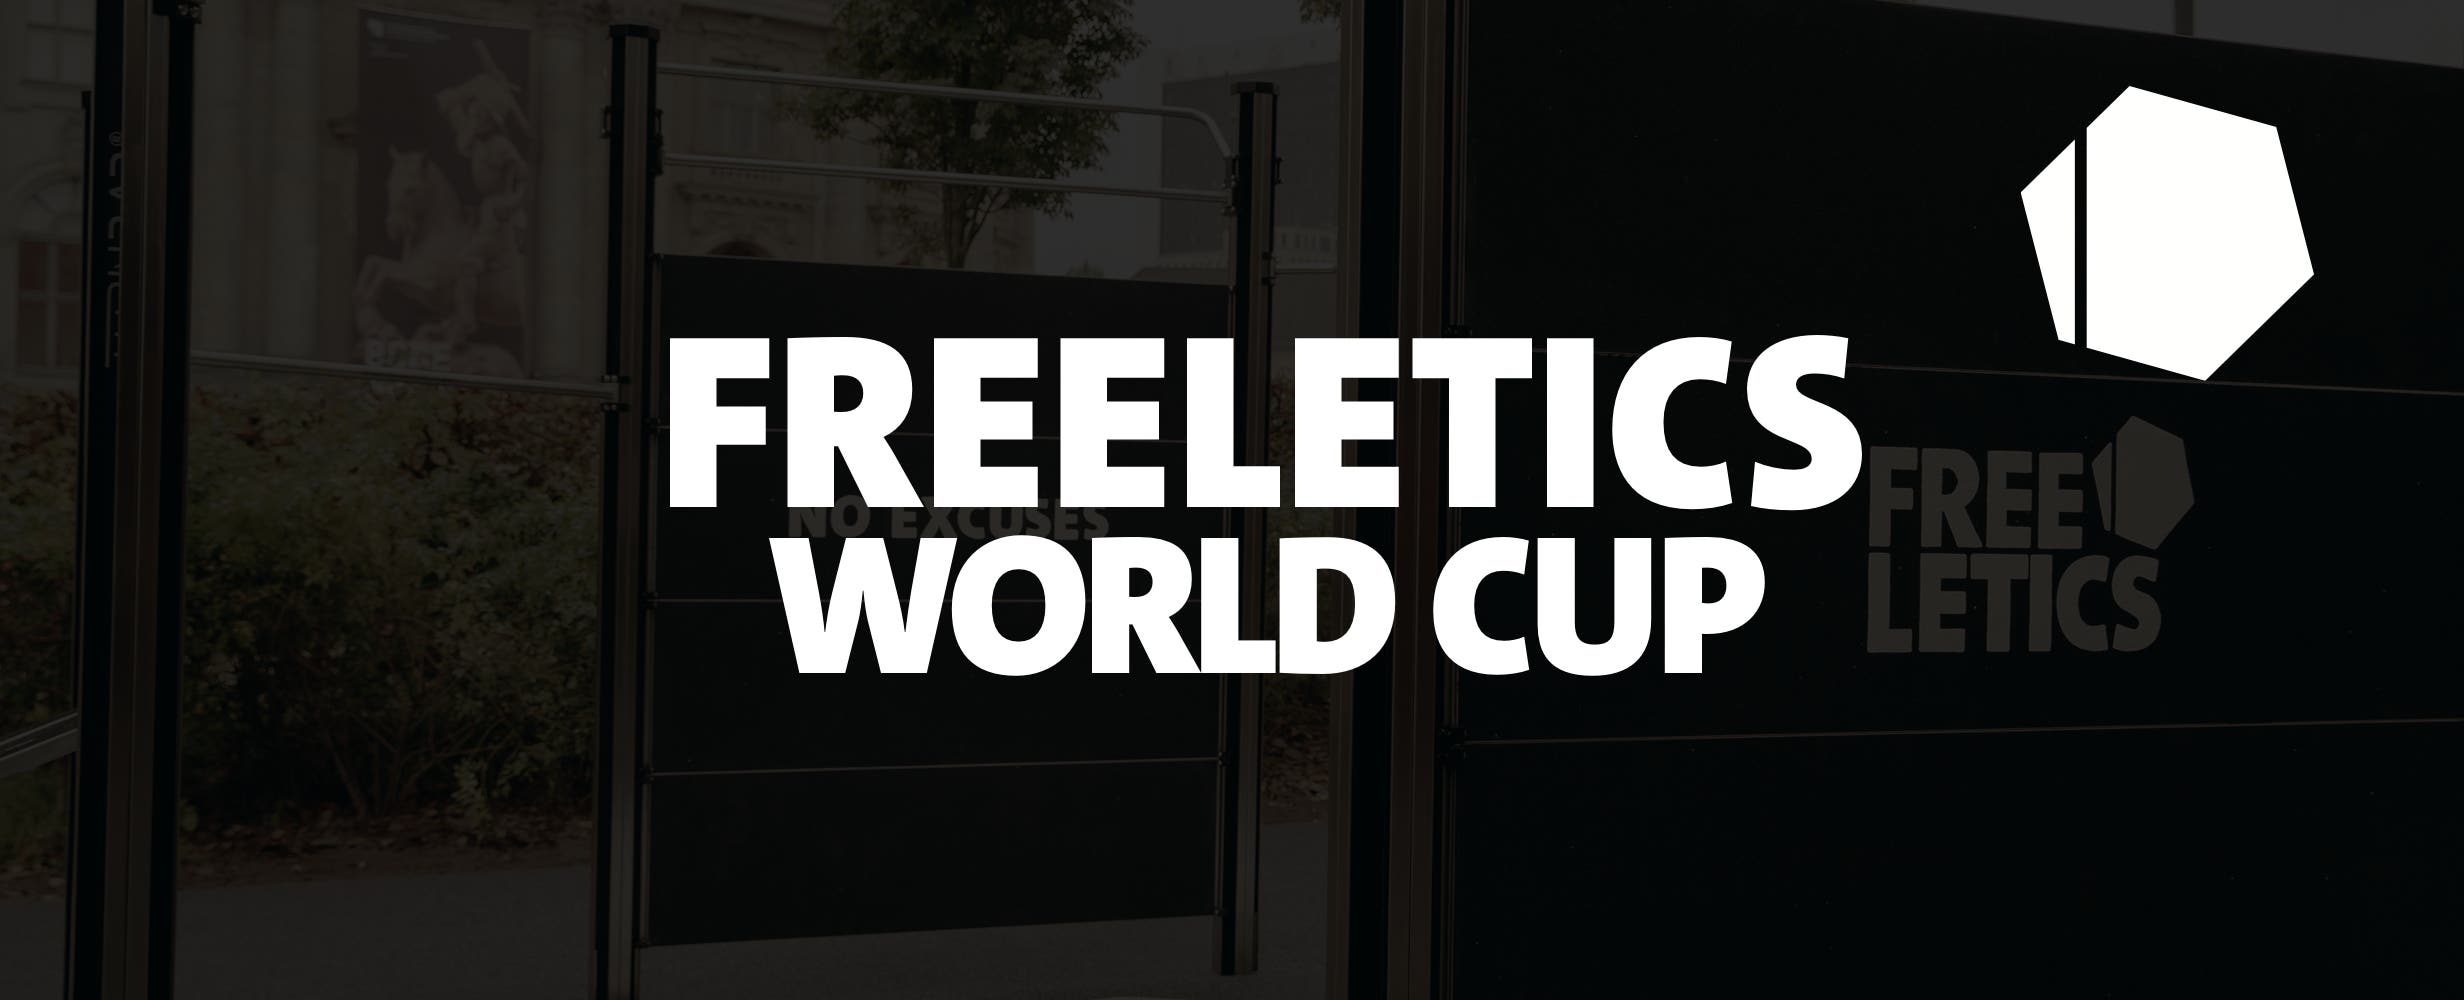 Freeletics World Cup Final News